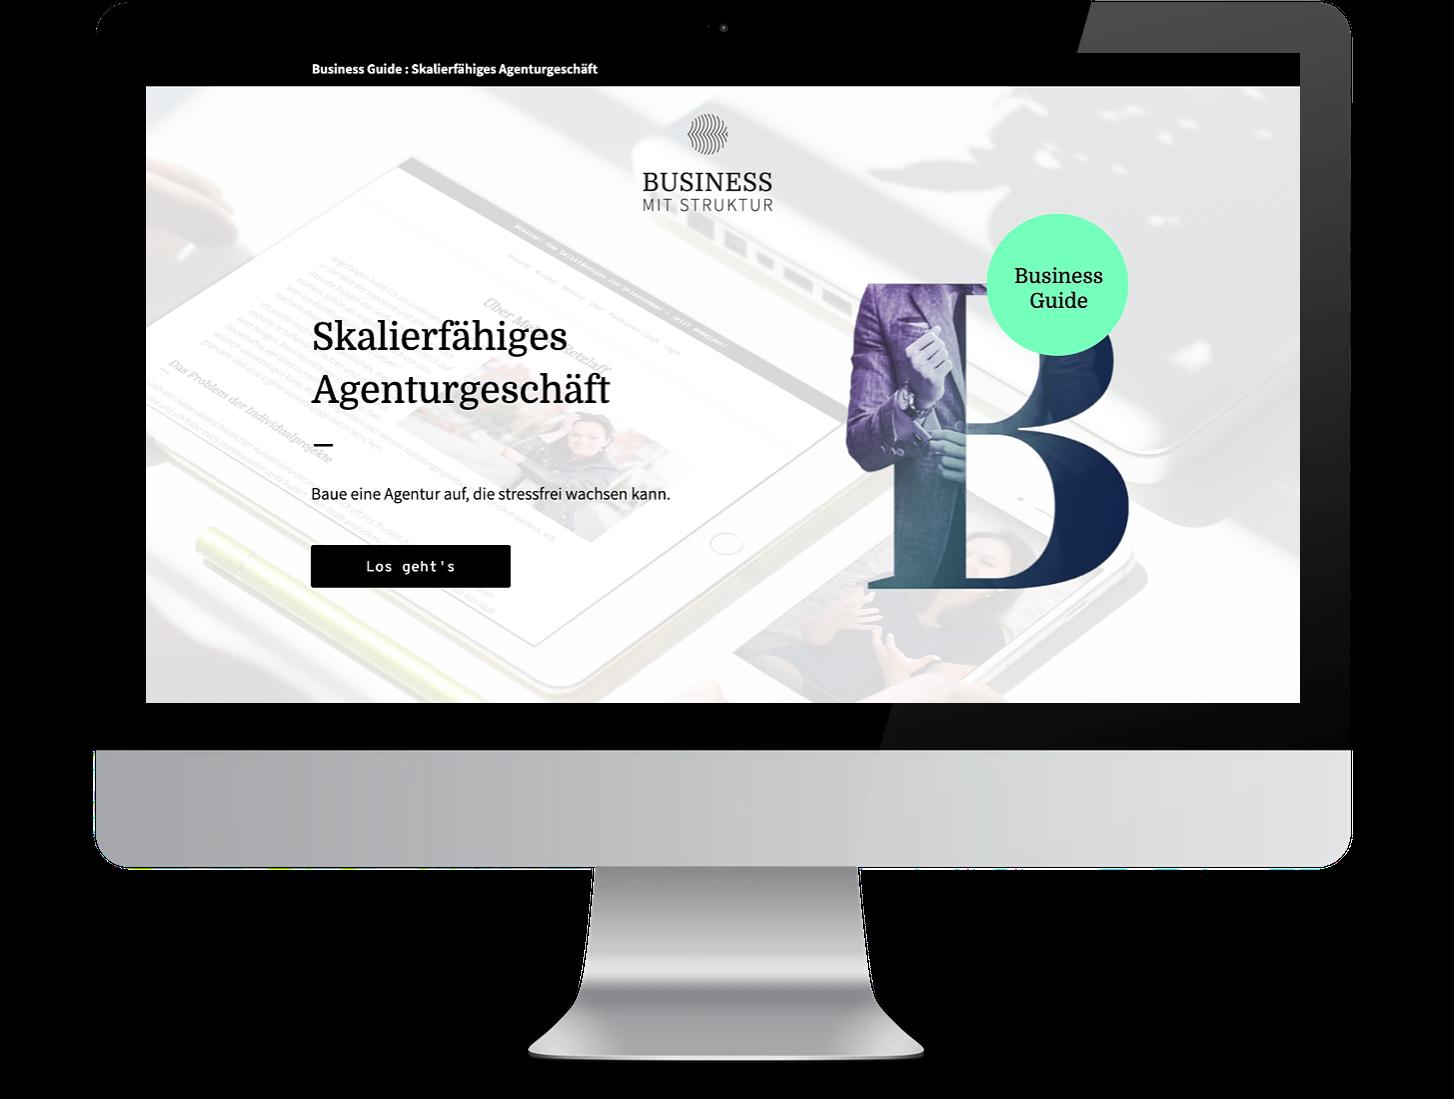 Business Guide Agentur